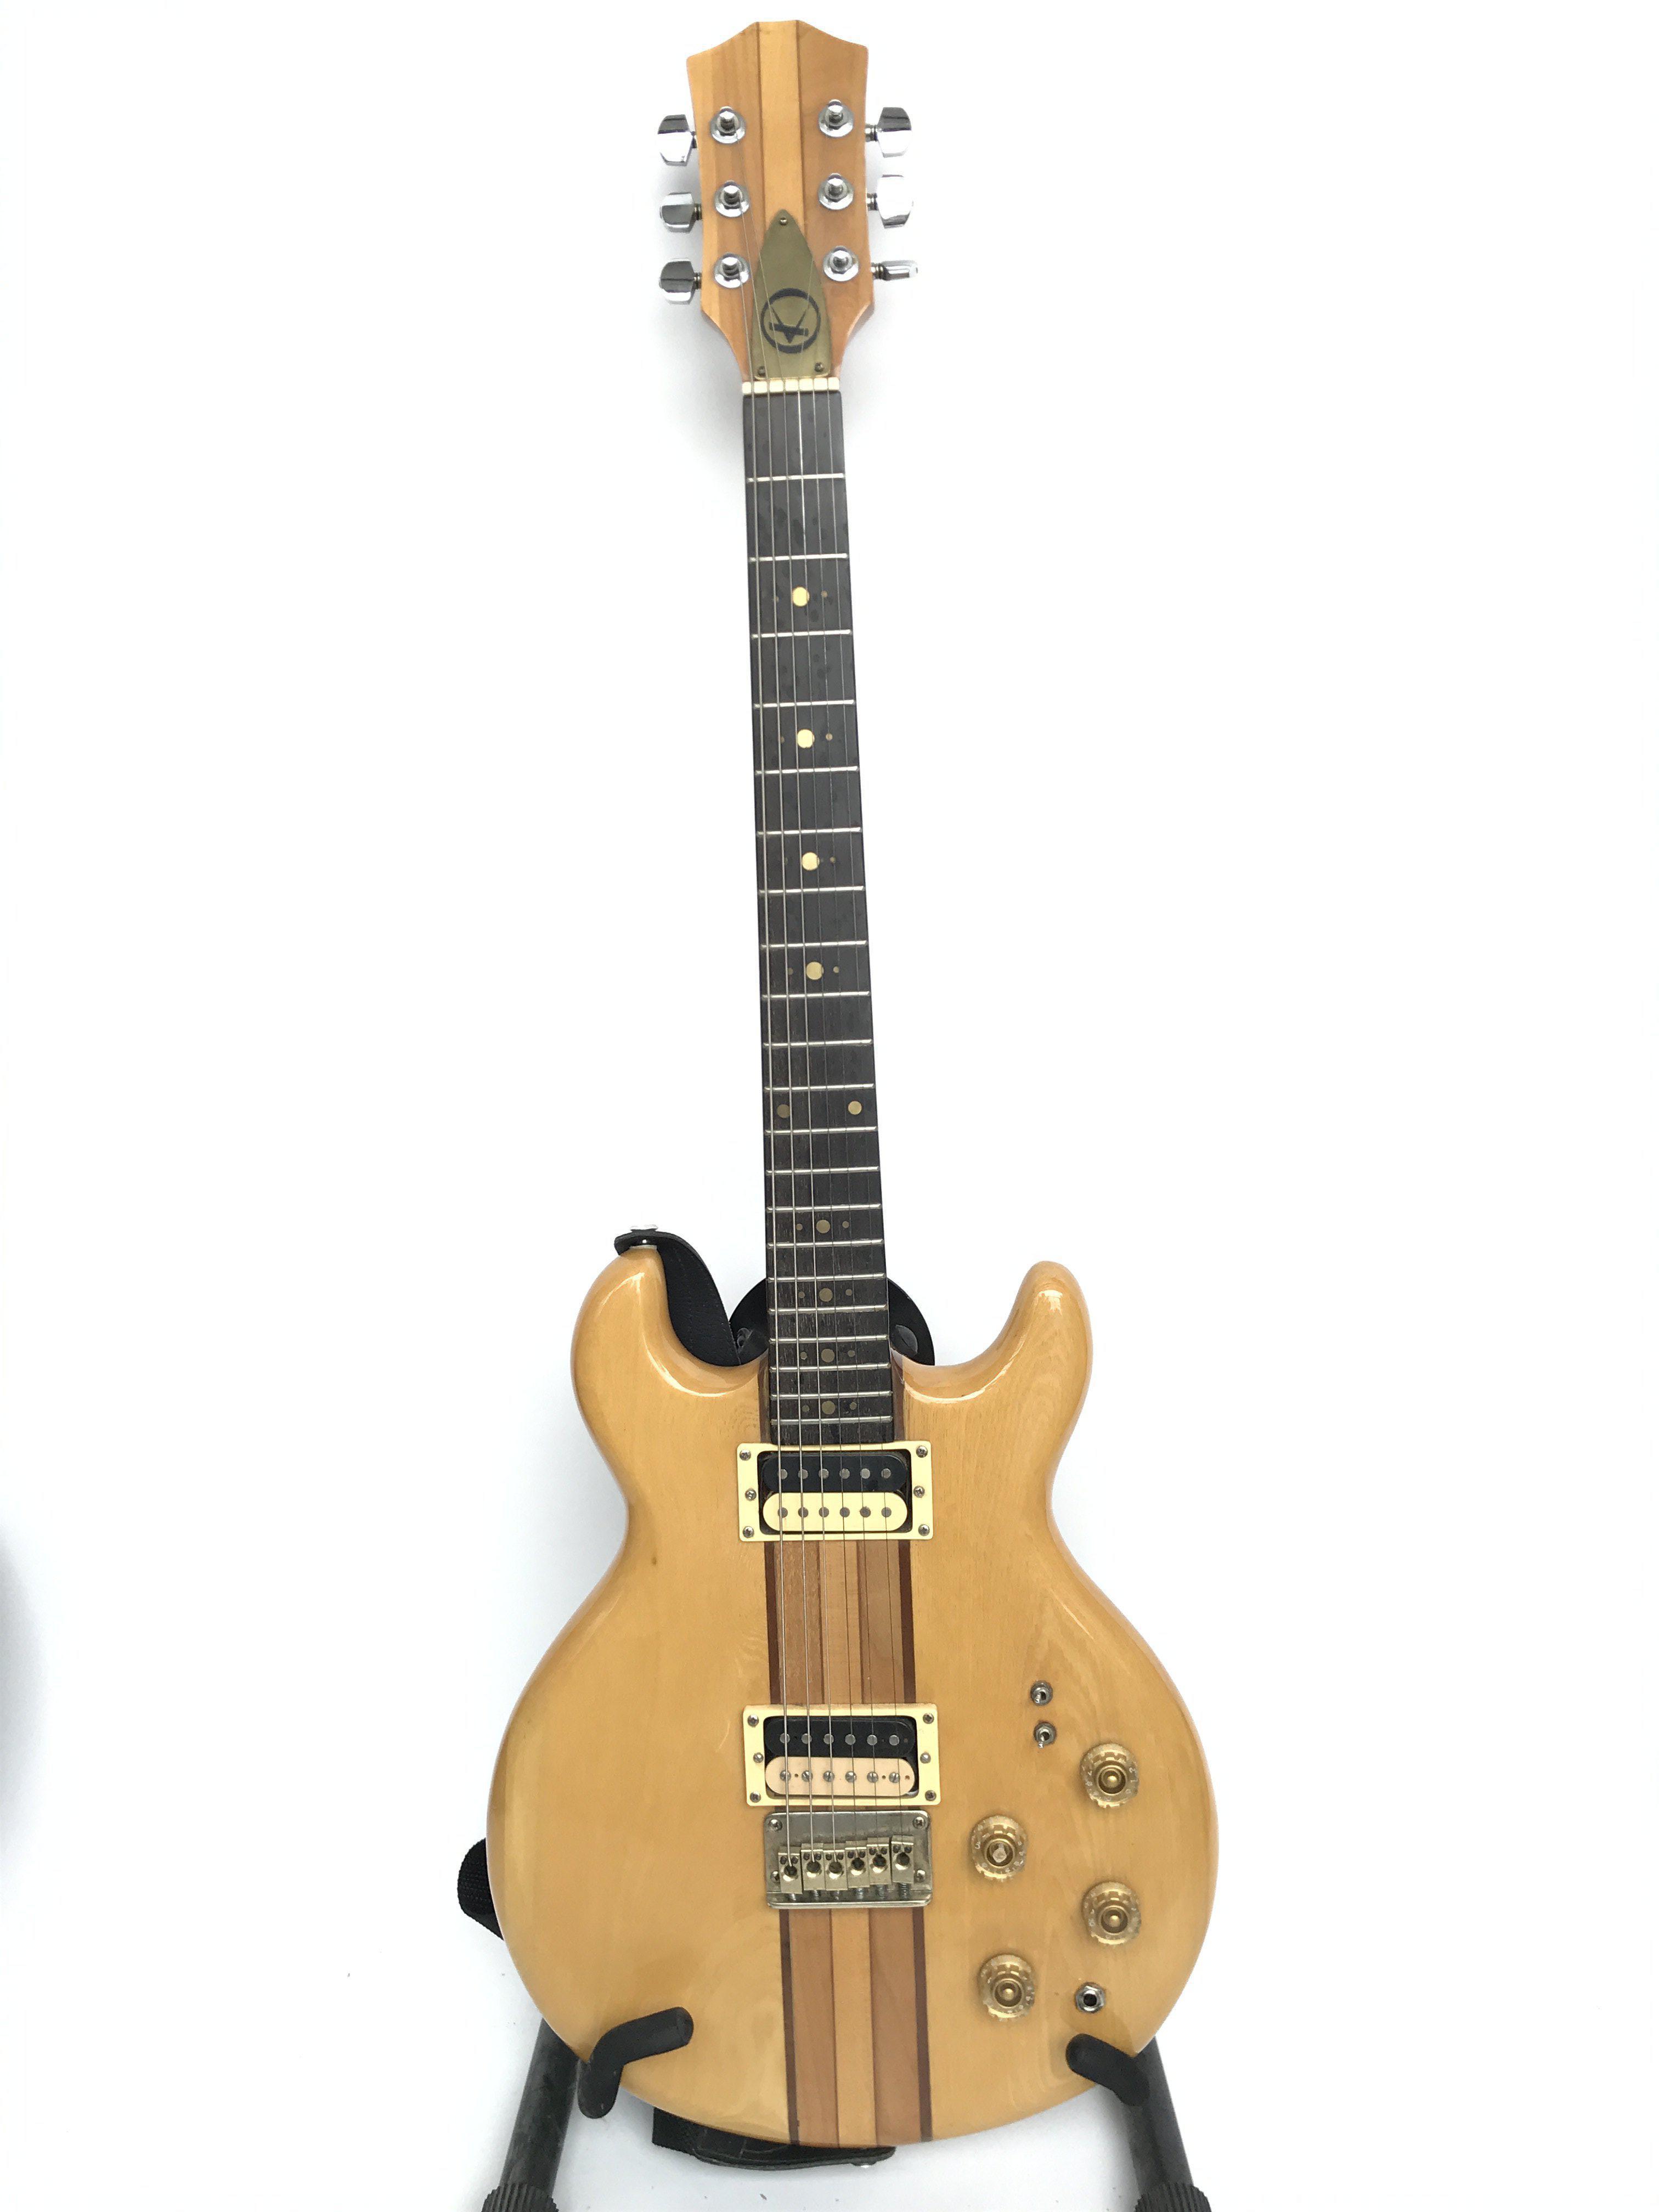 An unusual Kay neckthru body electric guitar, made